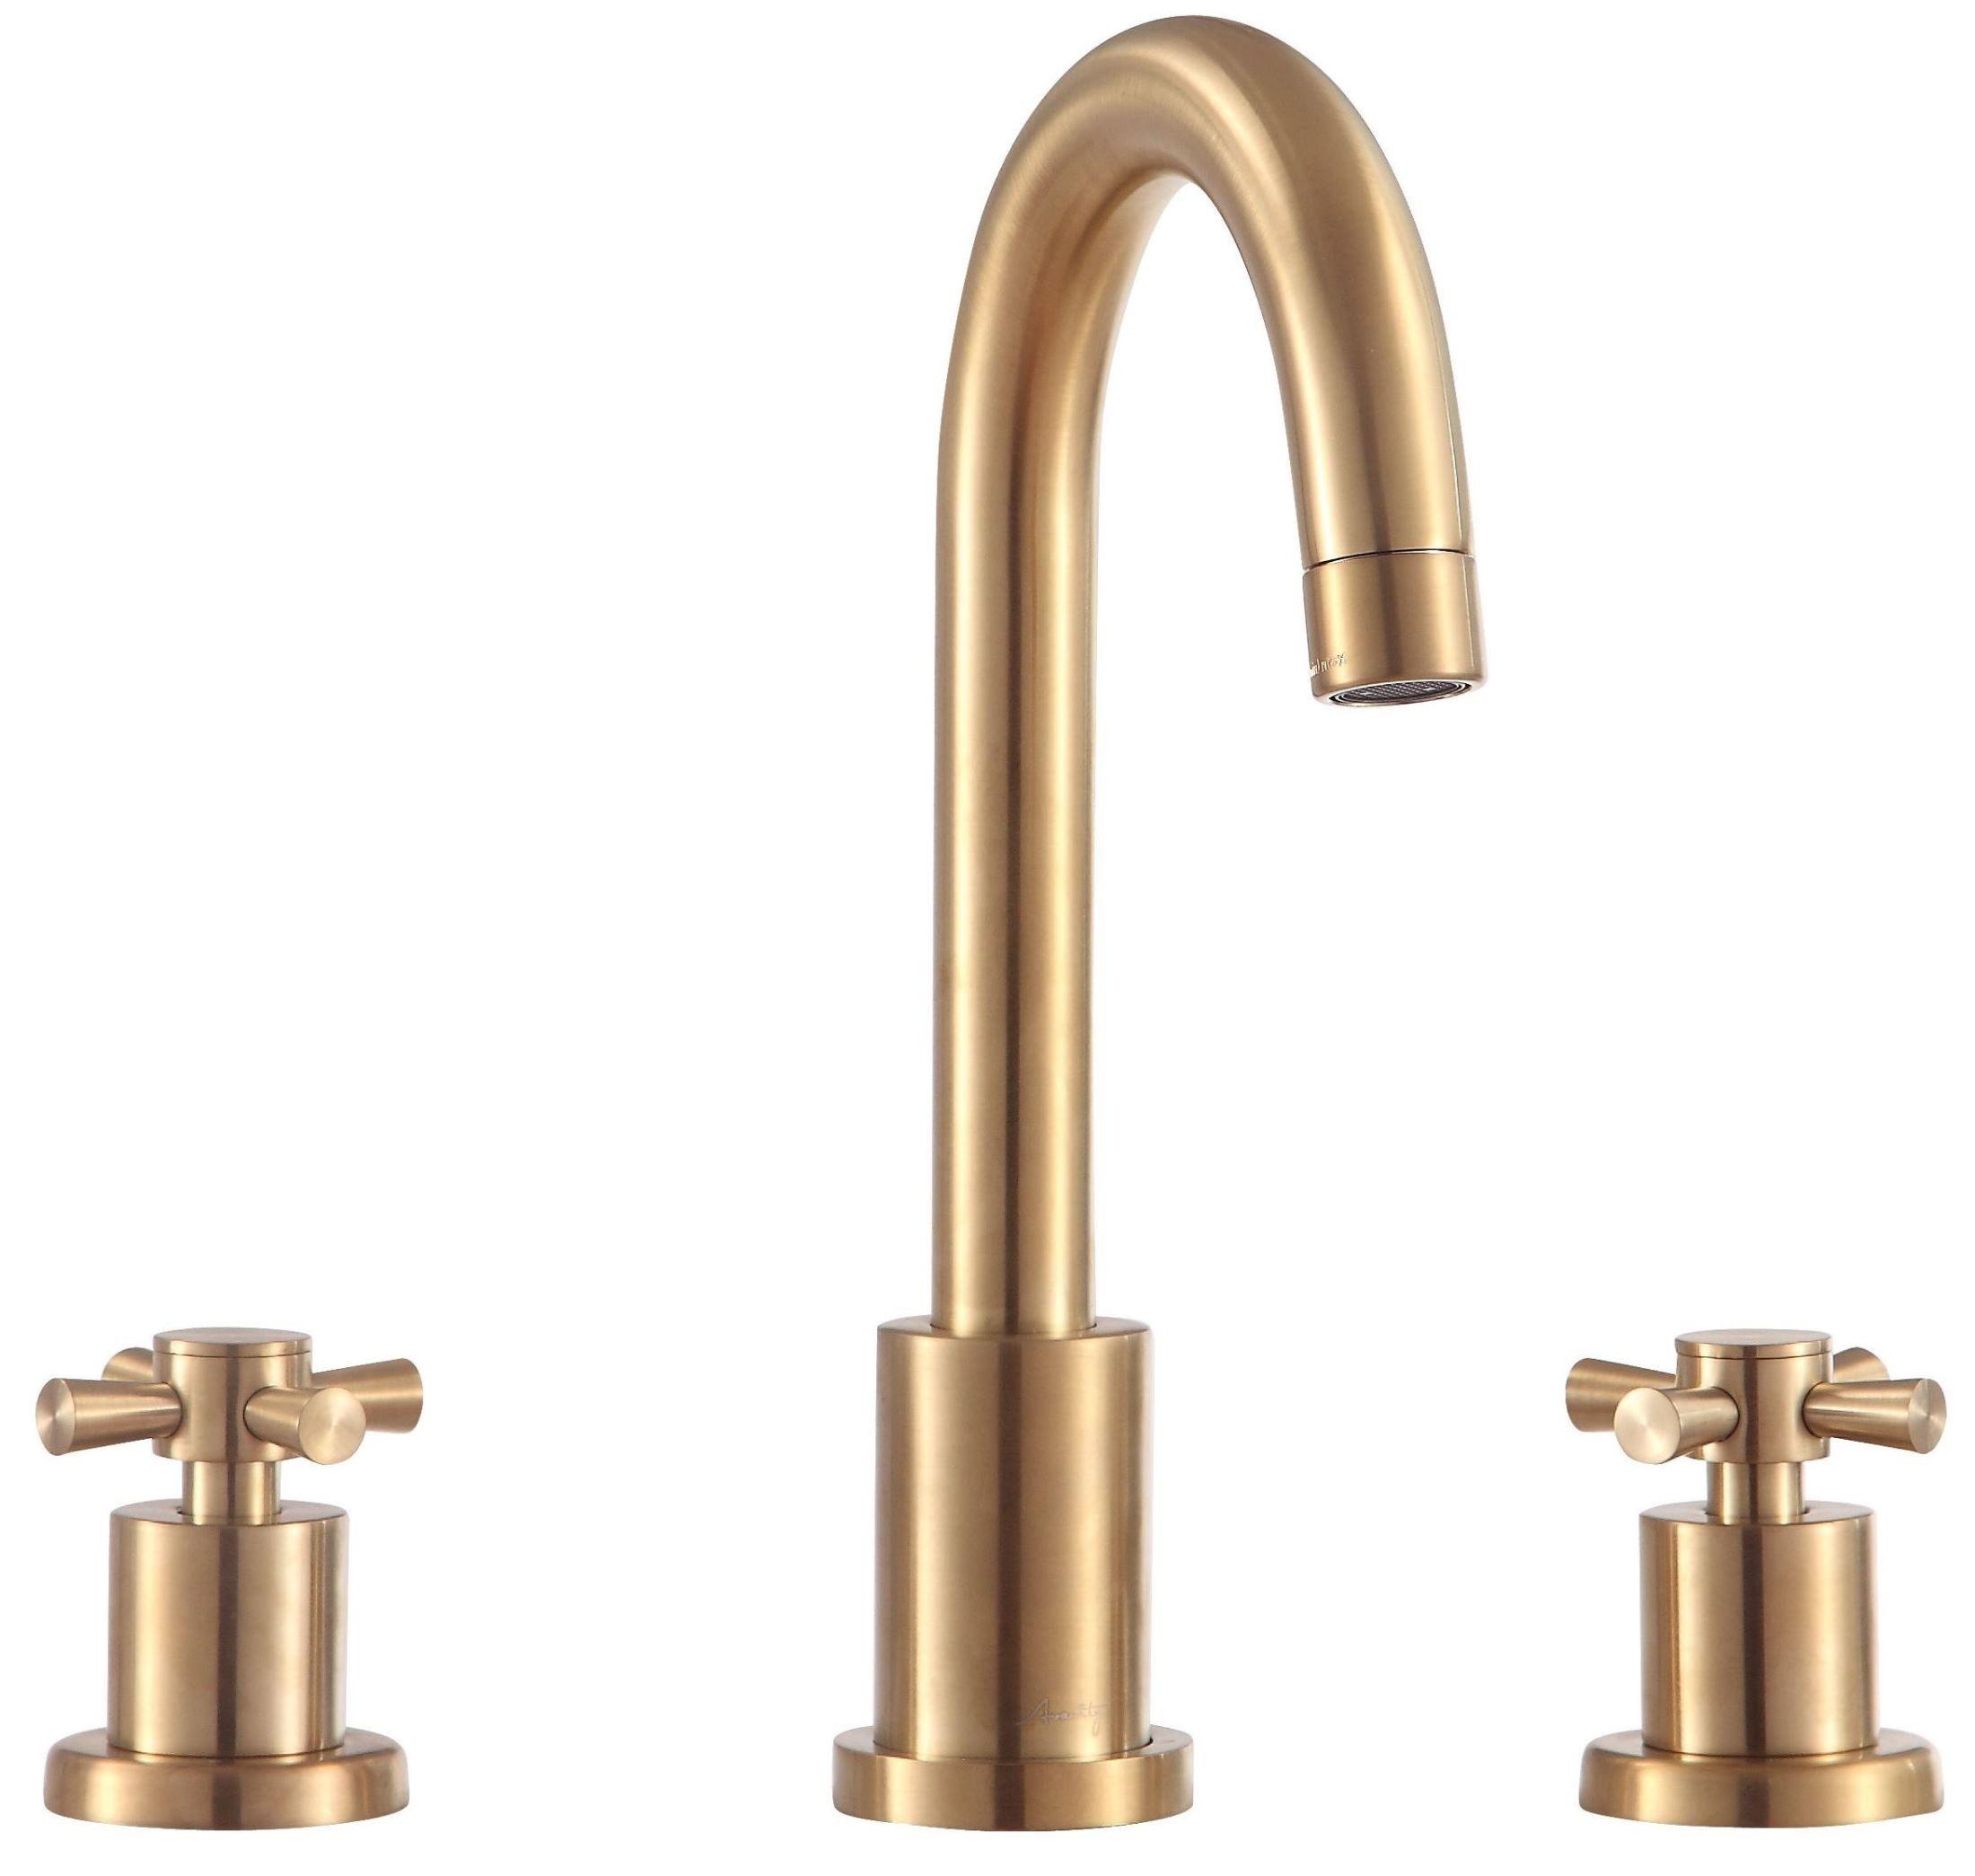 Messina Matte Gold 8 Widespread 2 Handle Bath Faucet In 2020 Bath Faucet Bathroom Faucets Antique Brass Bathroom Faucet